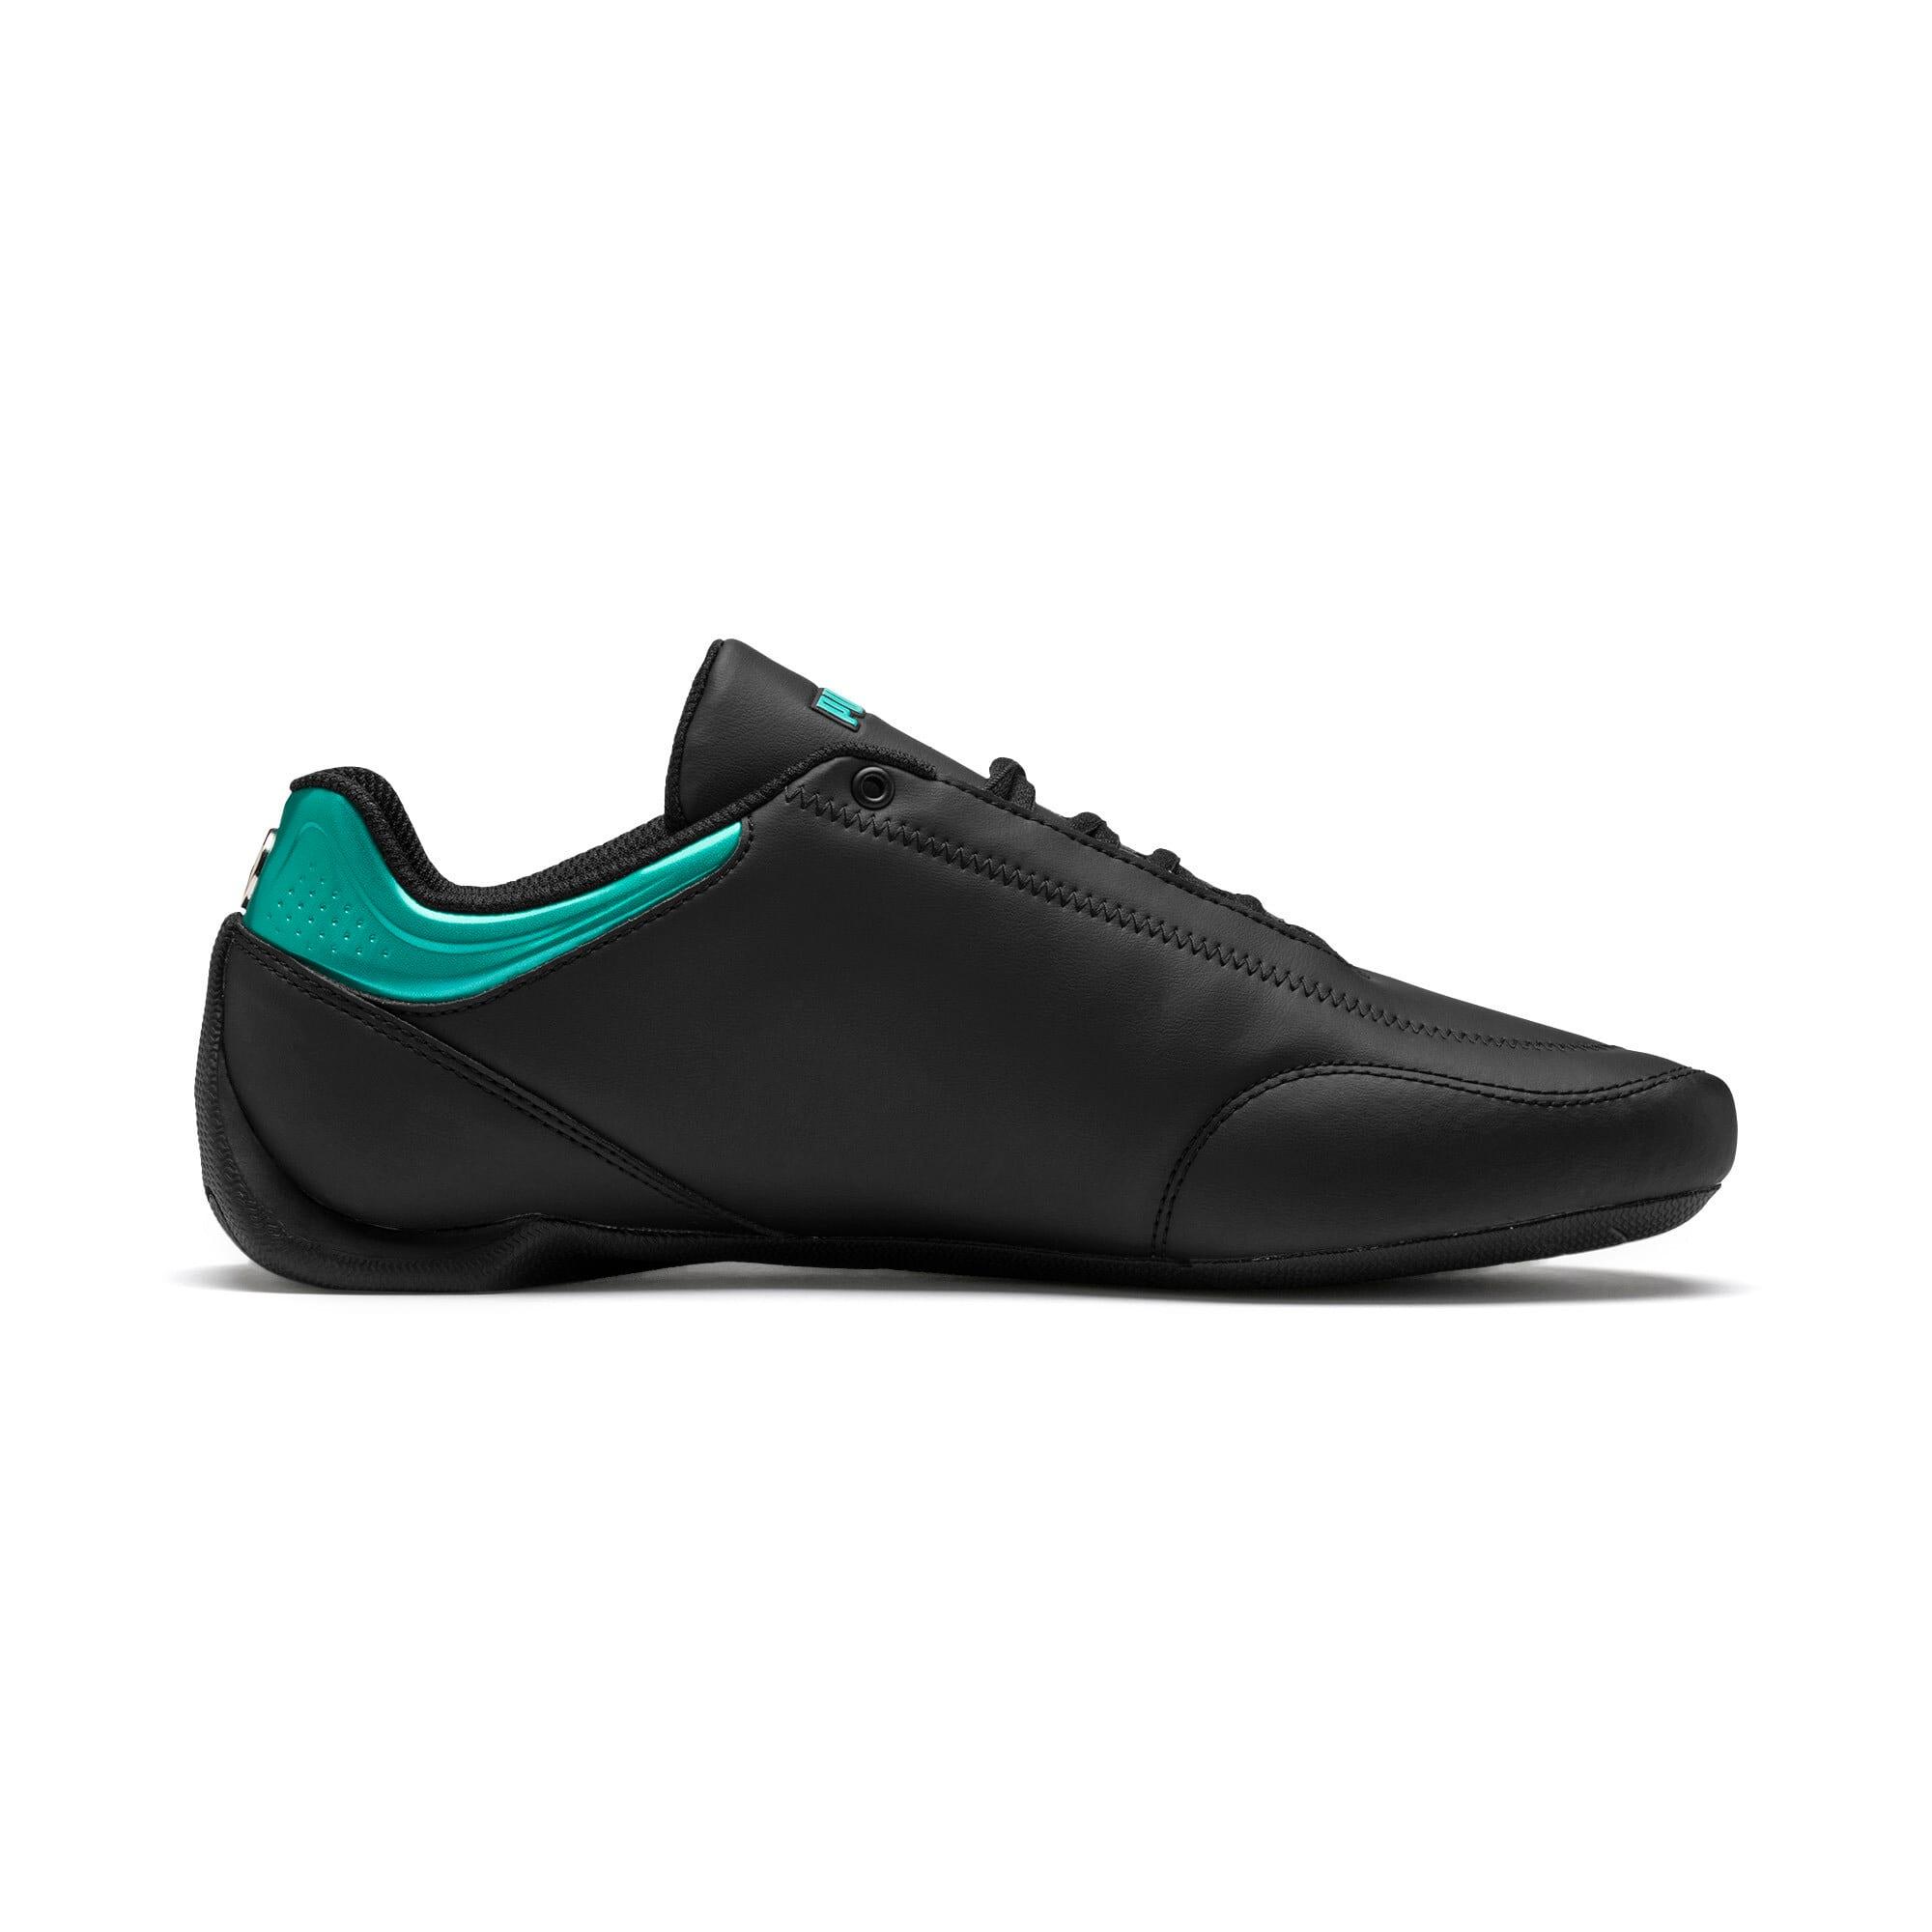 Thumbnail 6 of Mercedes AMG Petronas Future Kart Cat Shoes, Puma Black-Smoked Pearl, medium